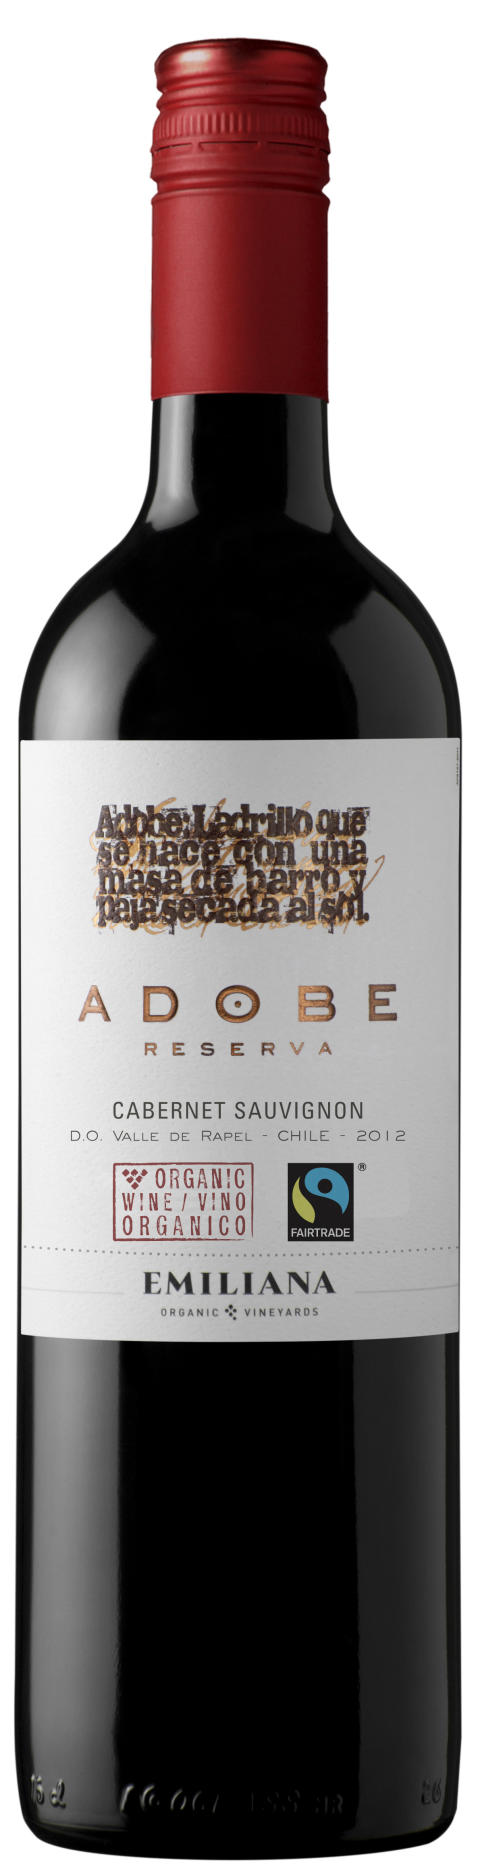 Adobe Cabernet Sauvignon